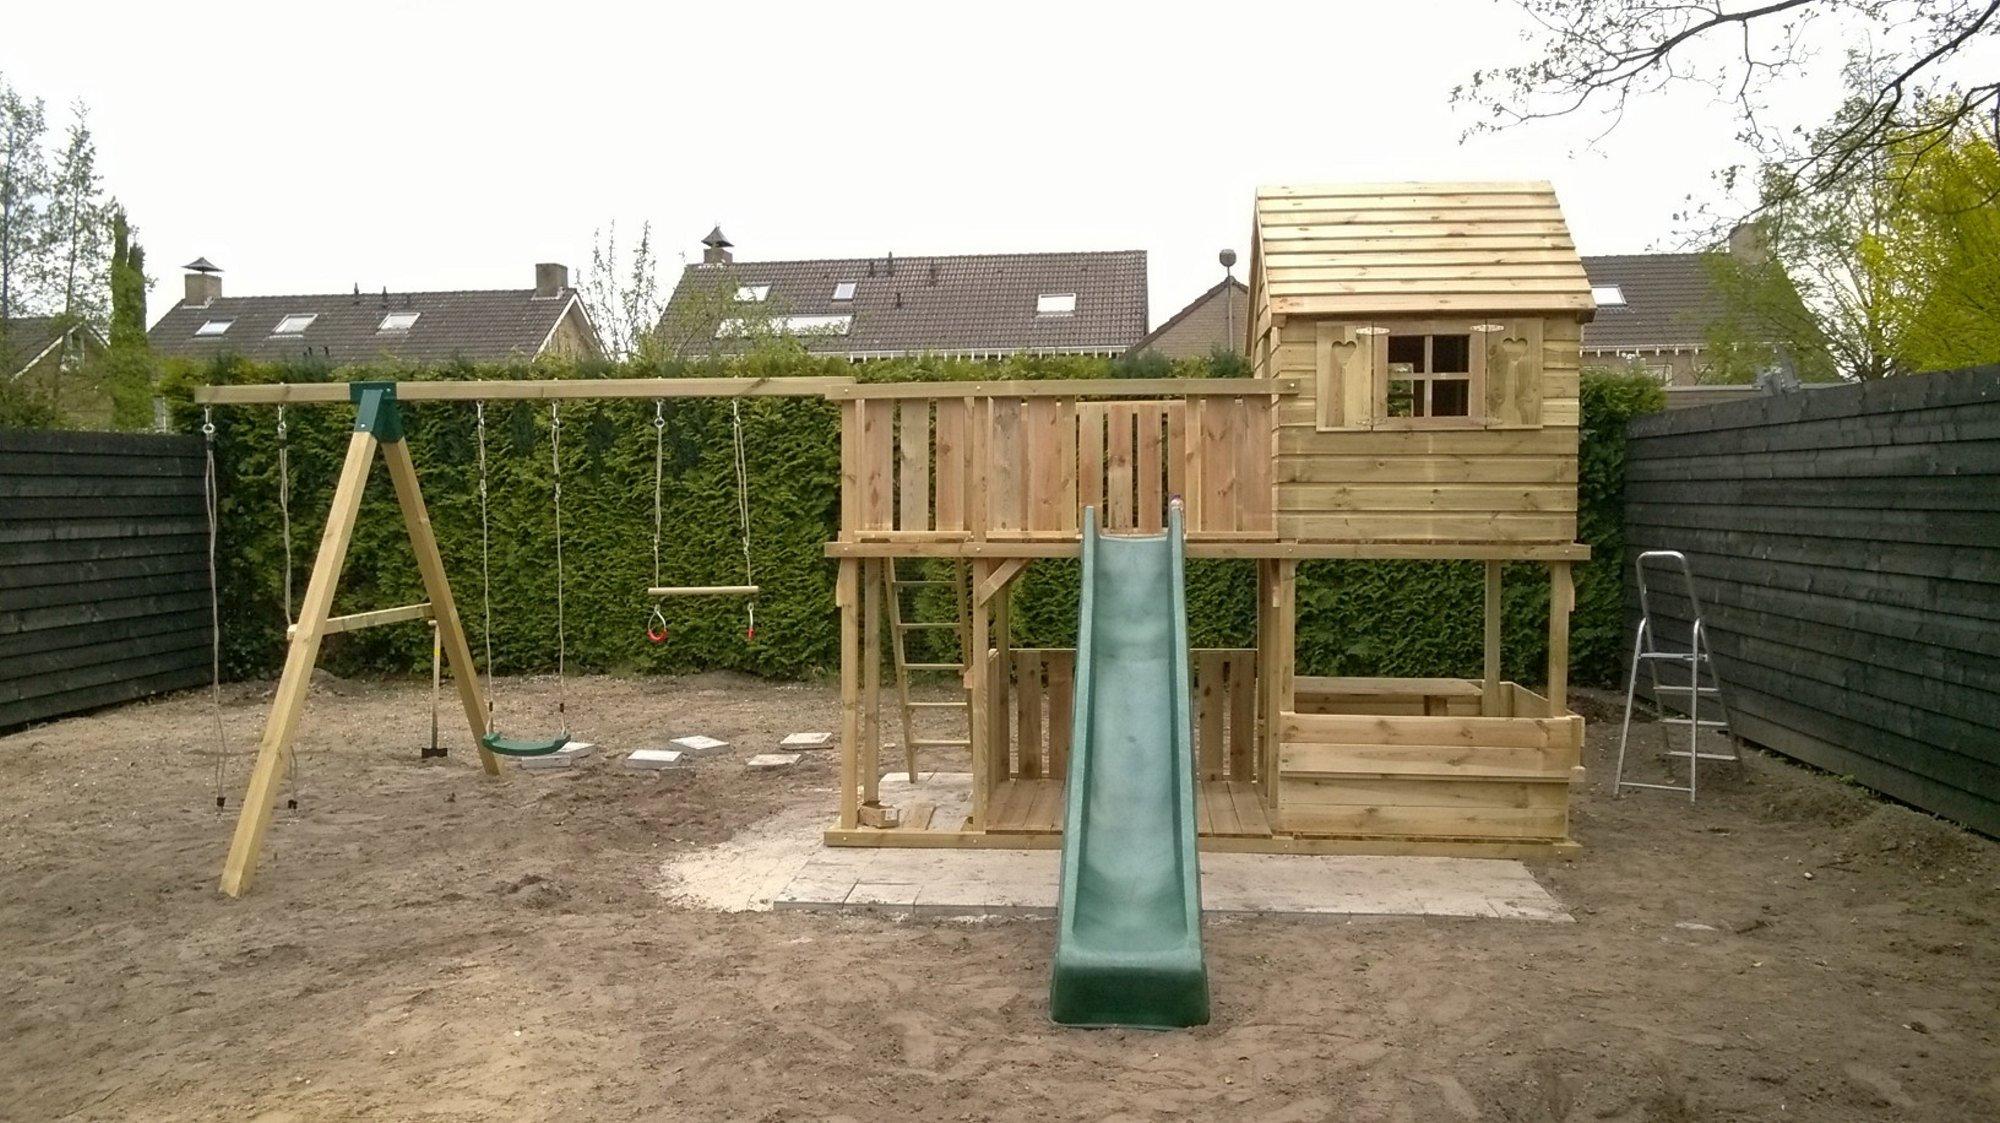 Speeltoestel Kleine Tuin : Tuin speeltoestel zelf speeltoestel maken andny54